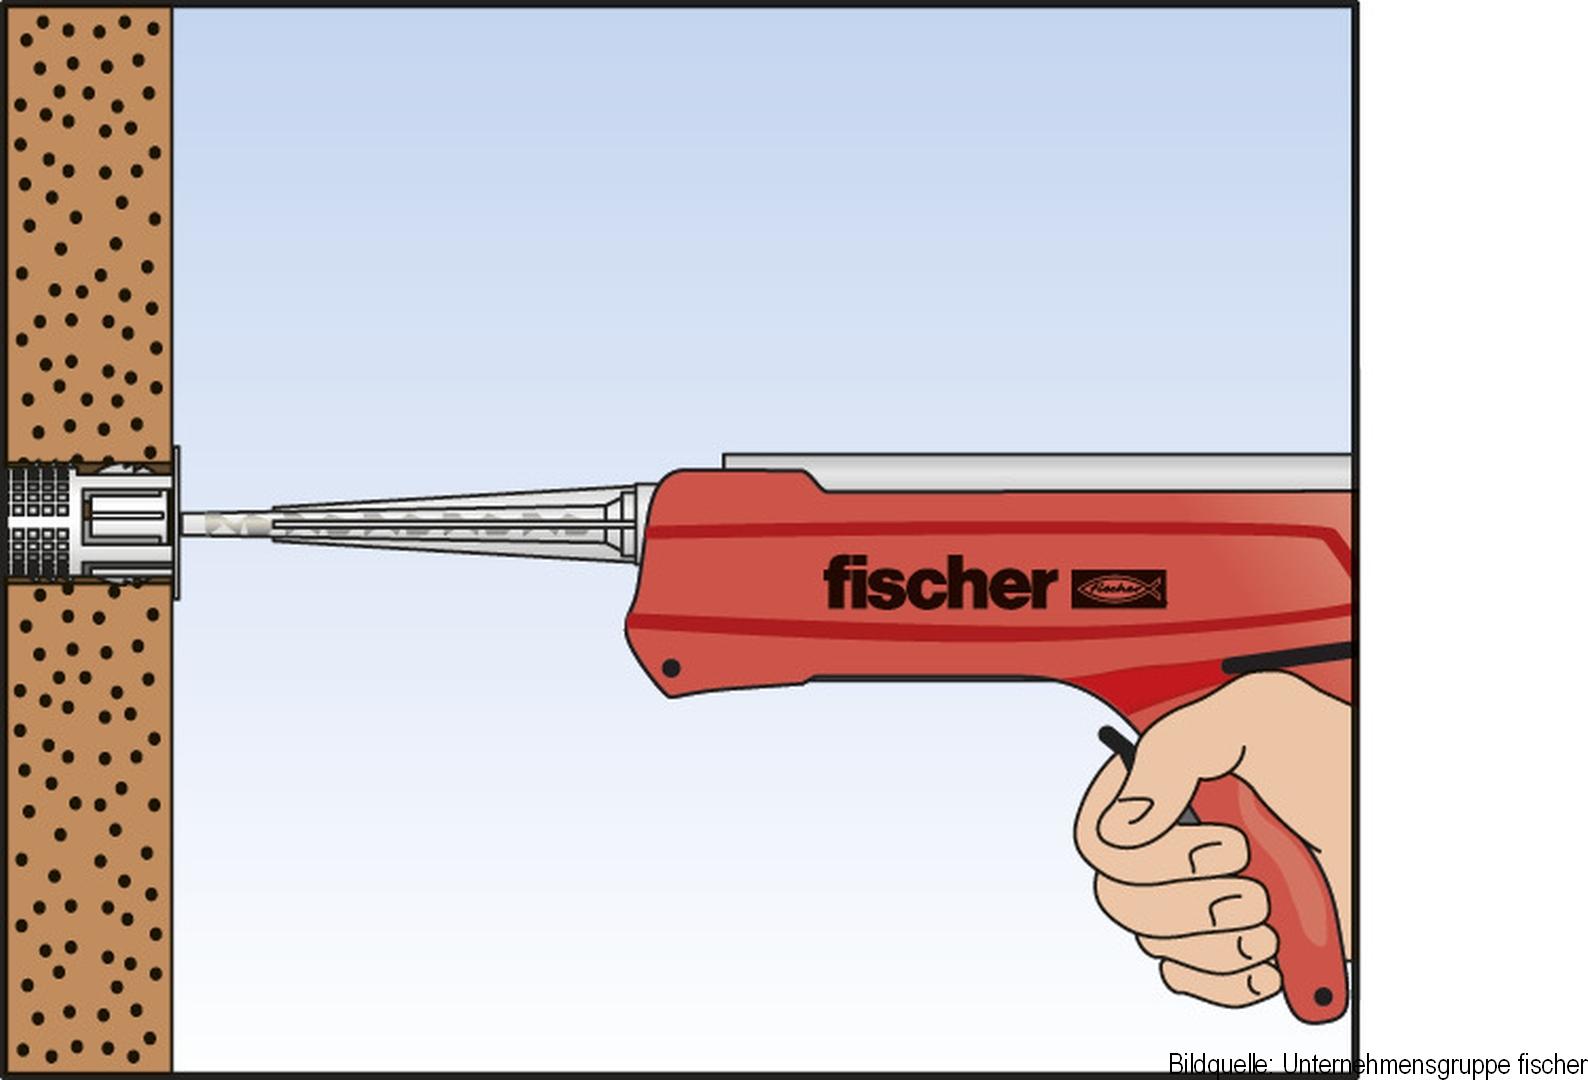 fischer Injektions-Ankerhülse Kunststoff FIS H 20 x 85 K, 20 Stück